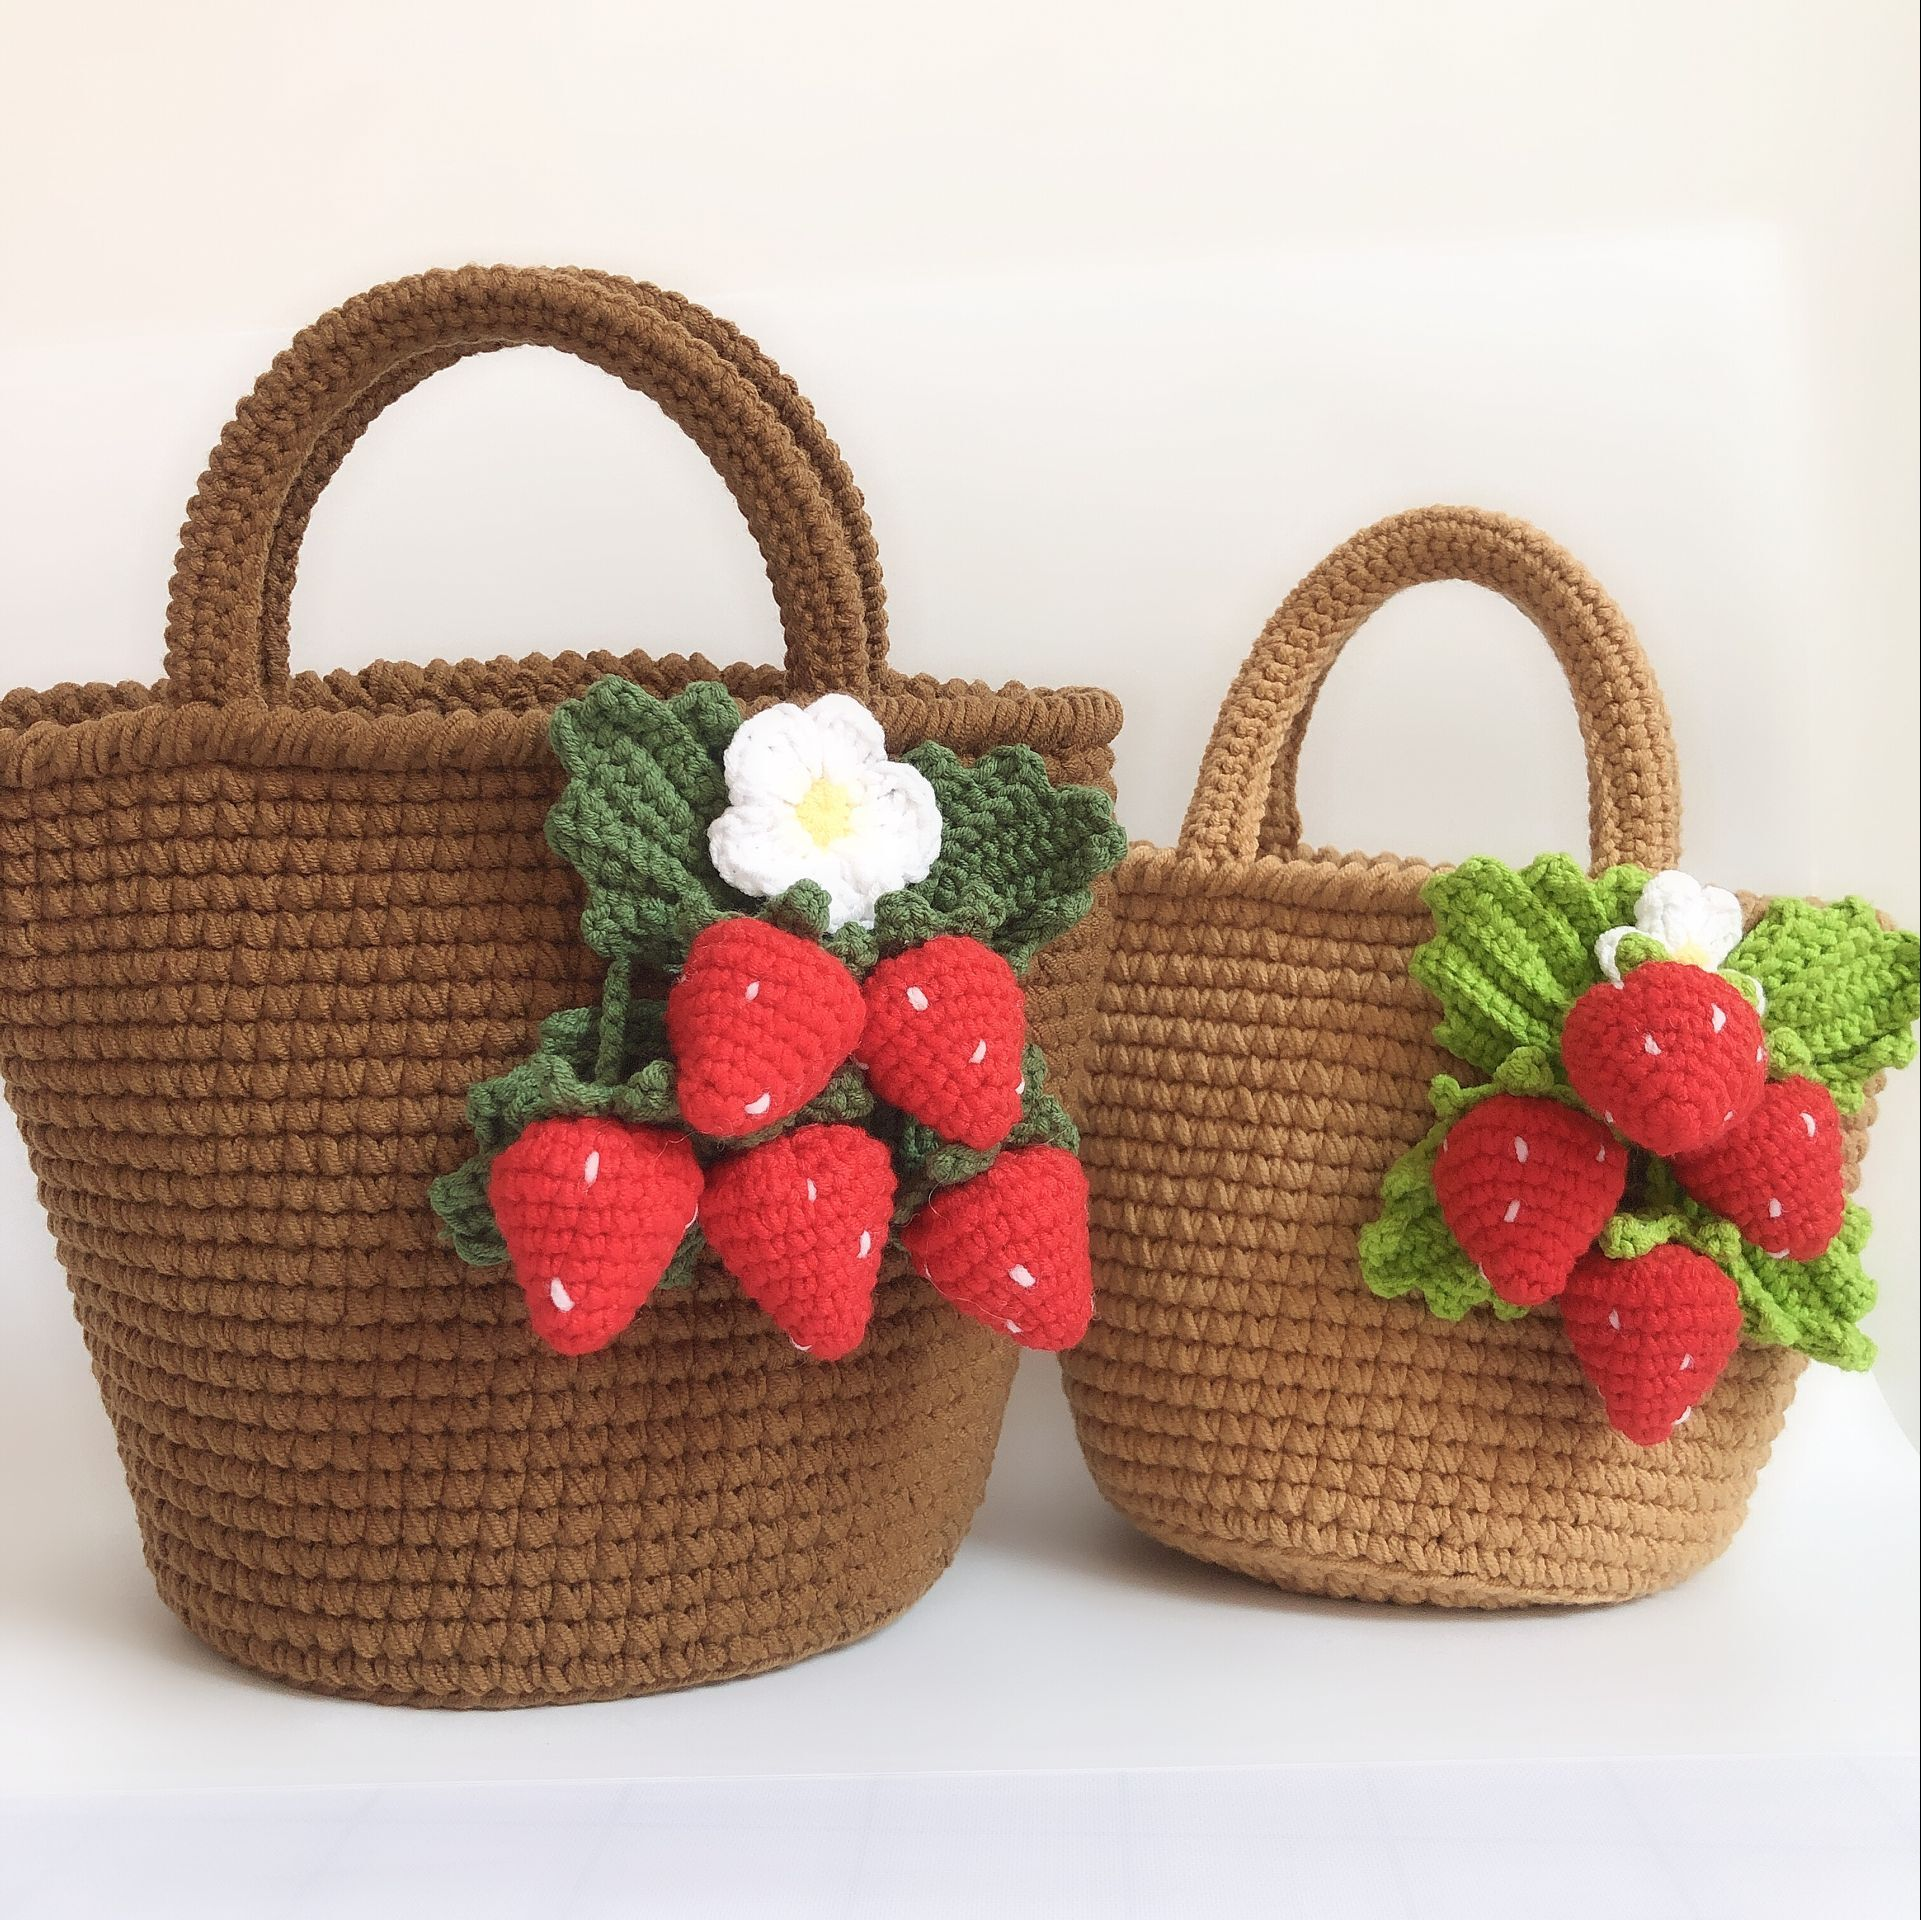 diy手提包 【不是成品】 手工毛线DIY钩针编织草莓手提包毛线材料包  莹手工_推荐淘宝好看的diy手提包